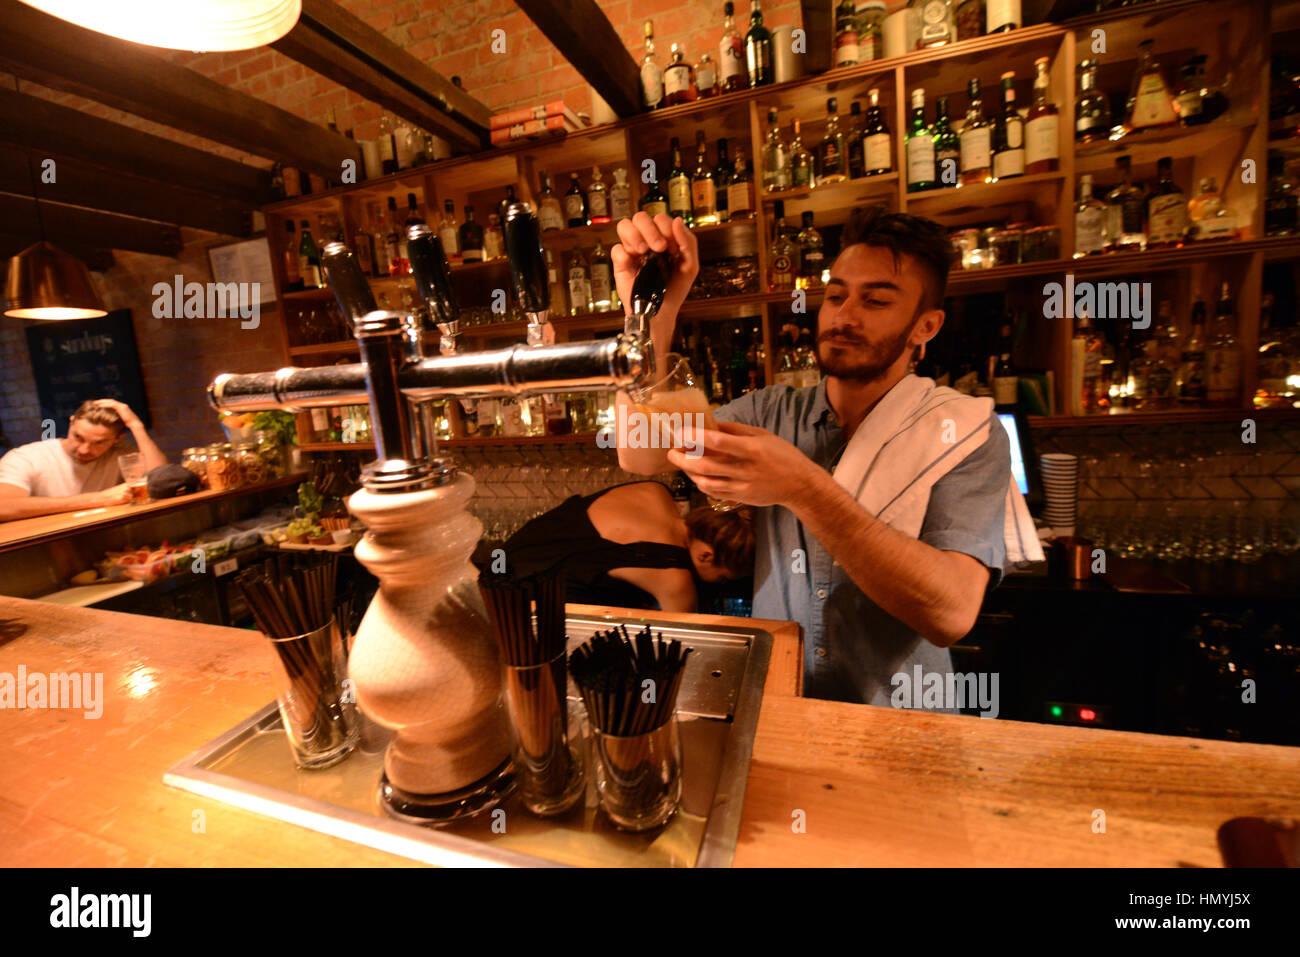 The trendy cool Udaberri Pintxos Y Vino bar in Adelaide, Australia. - Stock Image